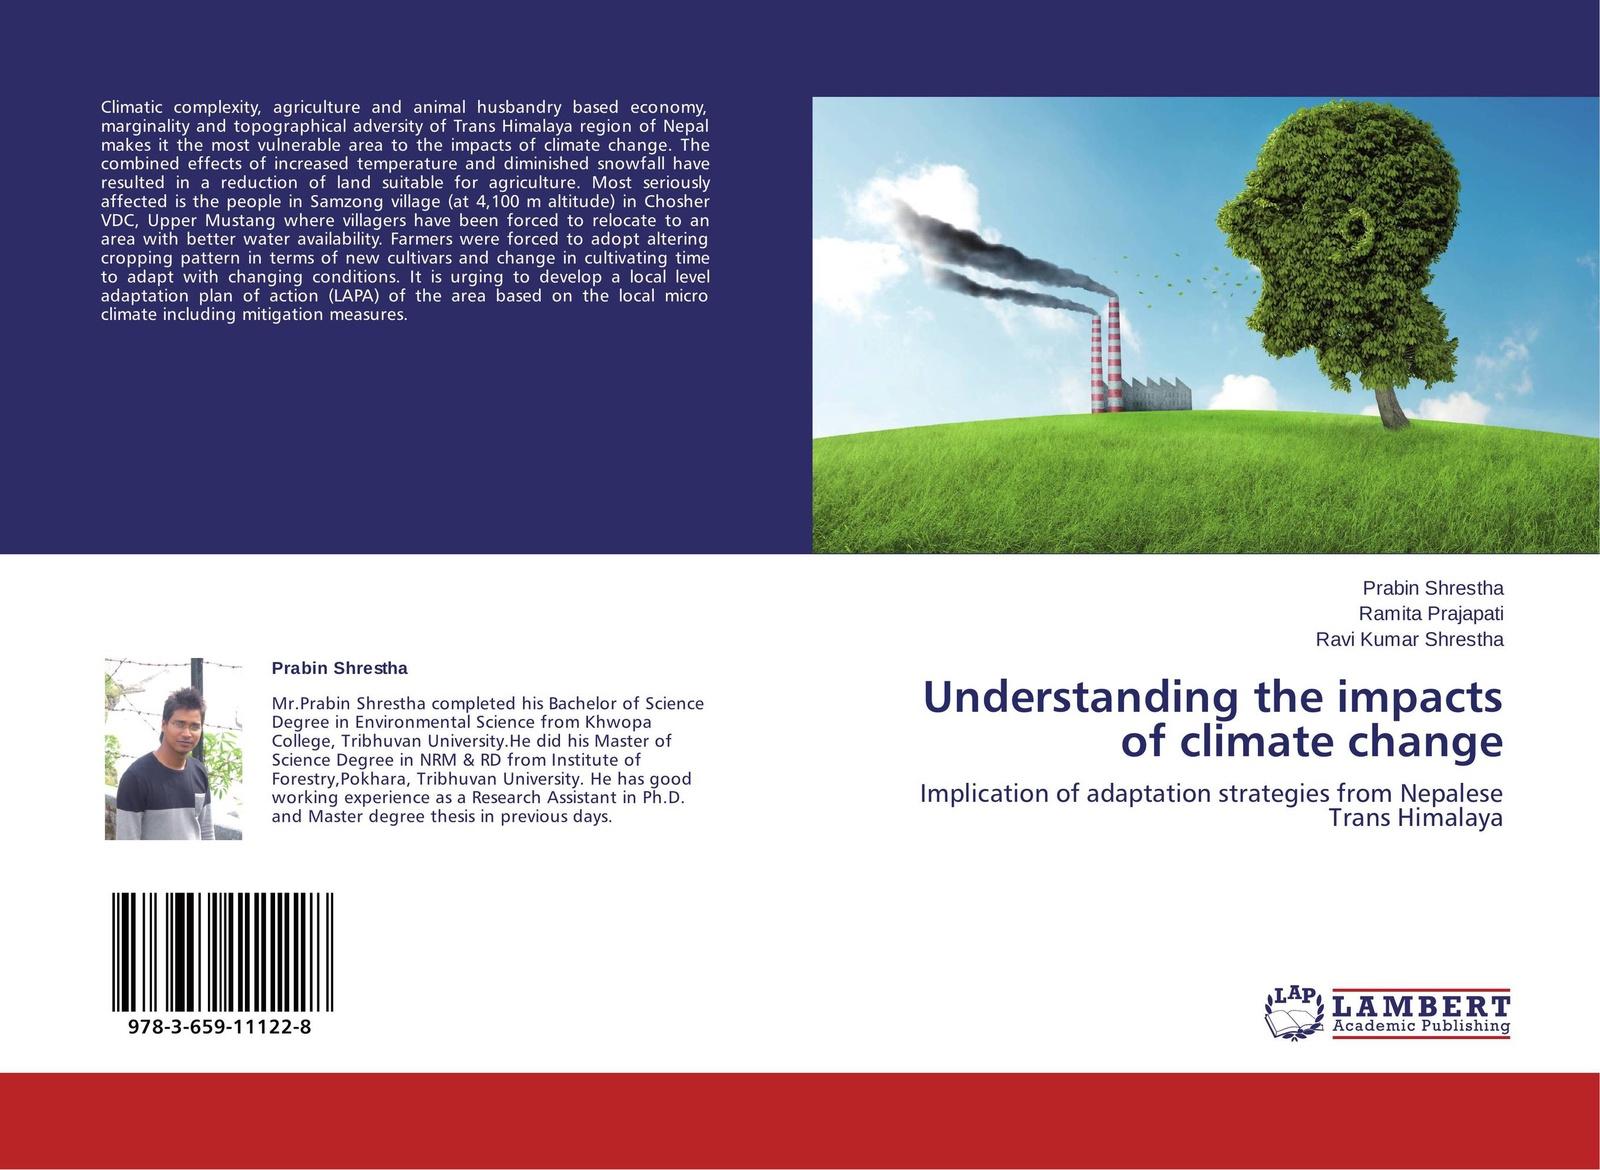 Prabin Shrestha,Ramita Prajapati and Ravi Kumar Shrestha Understanding the impacts of climate change impacts of climate change on groundwater